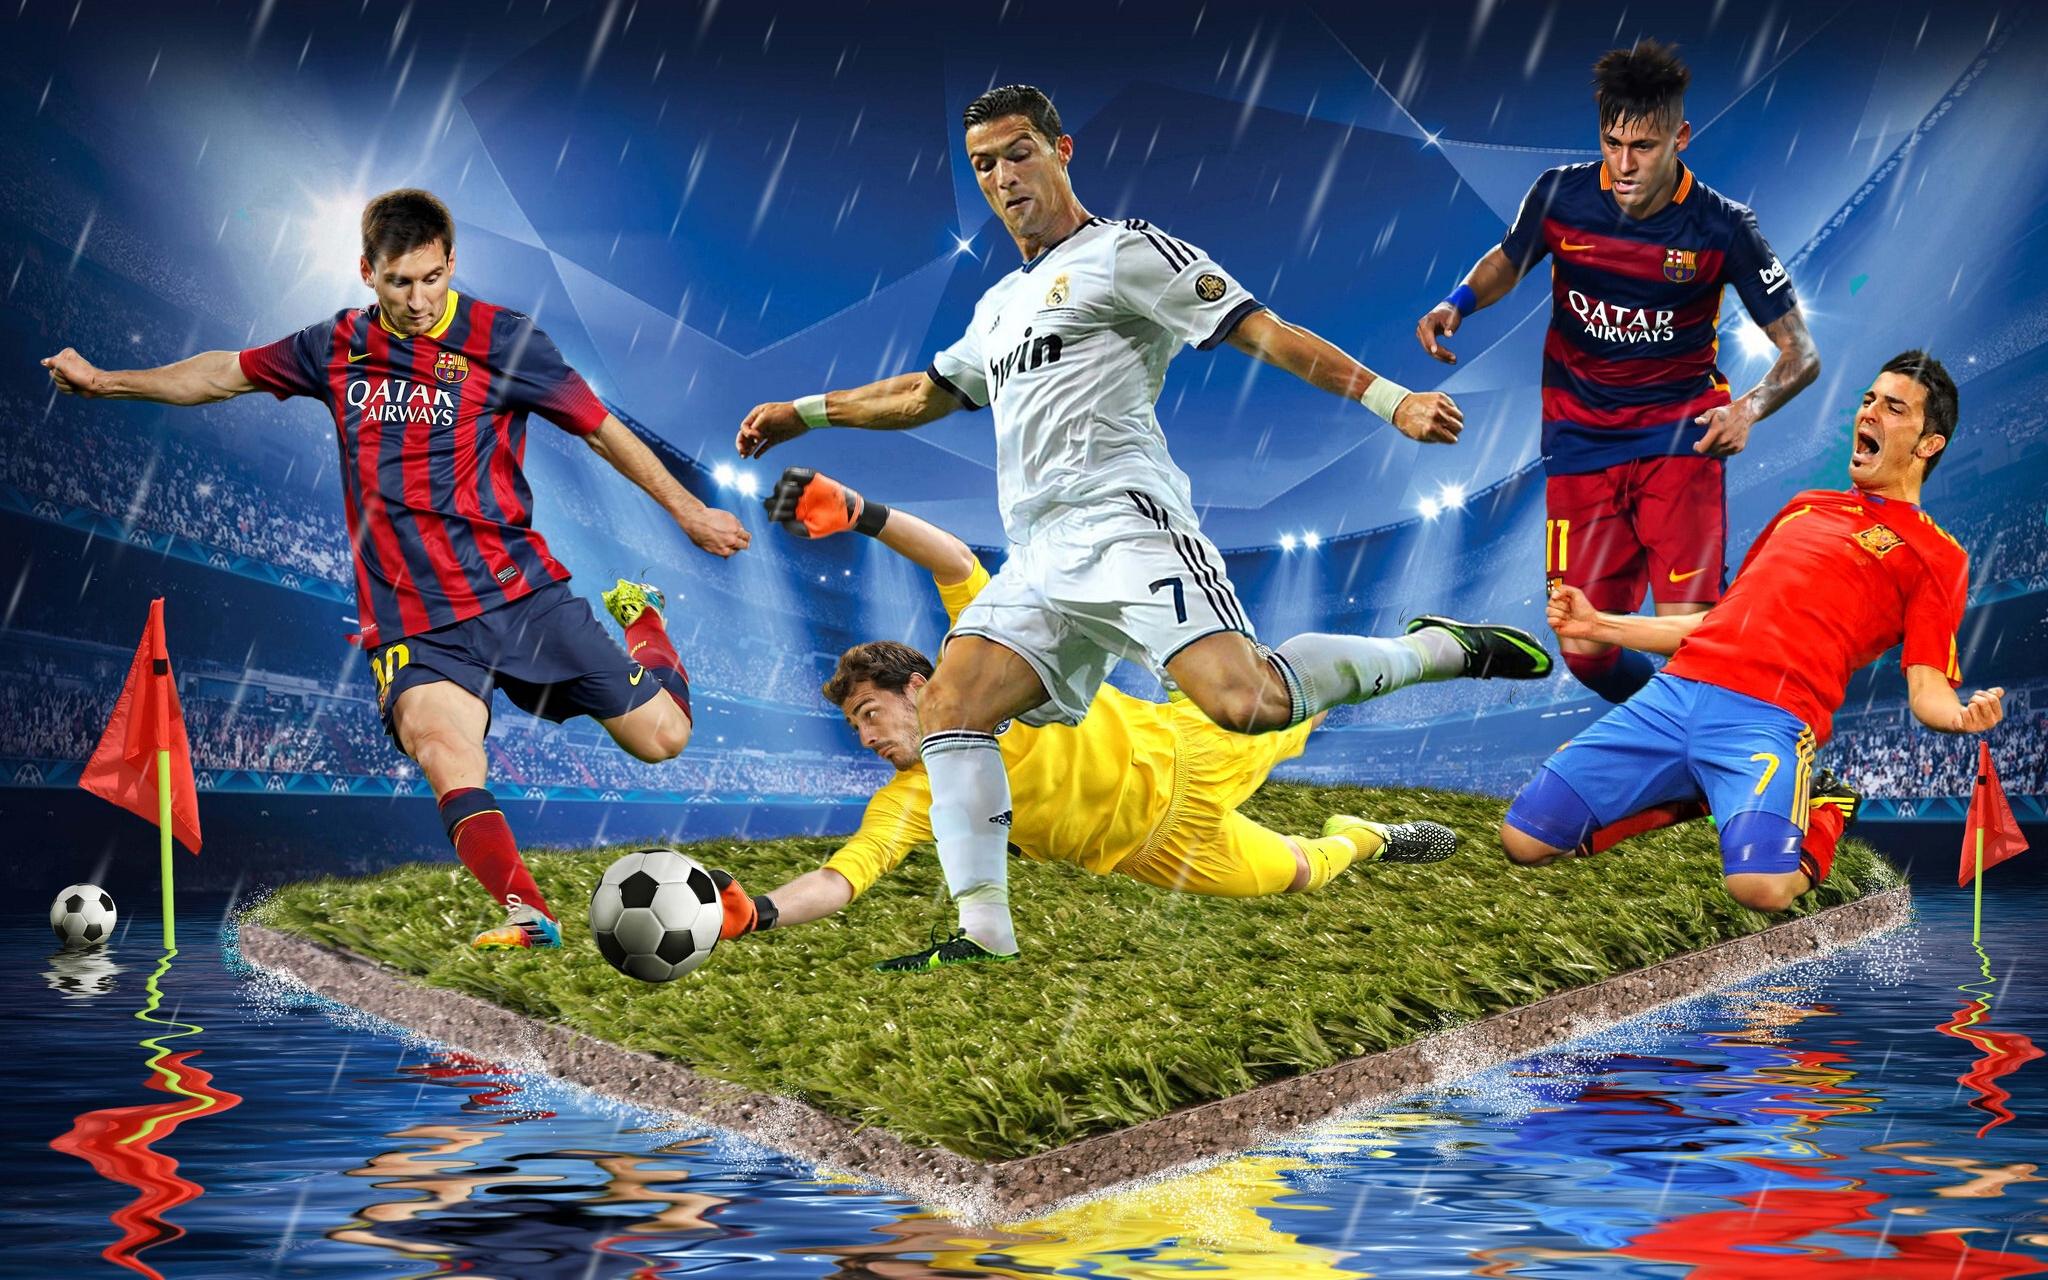 обои футбол, футболисты, островок, стадион картинки фото